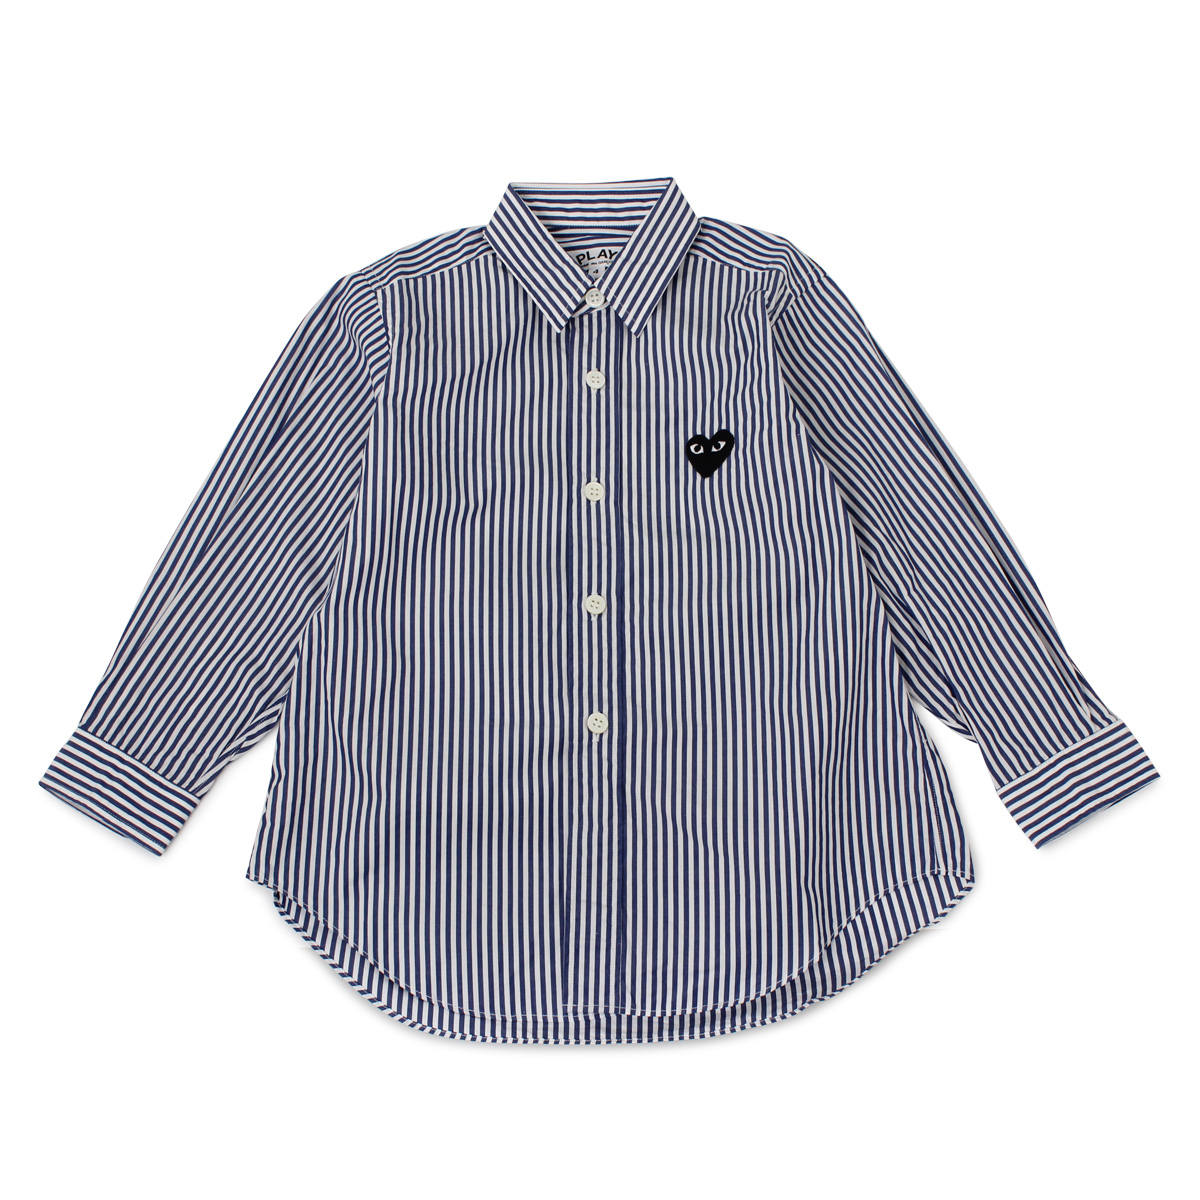 PLAY COMME des GARCONS BLACK HEART STRIPE SHIRT プレイ コムデギャルソン シャツ 長袖 ボタンシャツ キッズ ネイビー B5071001